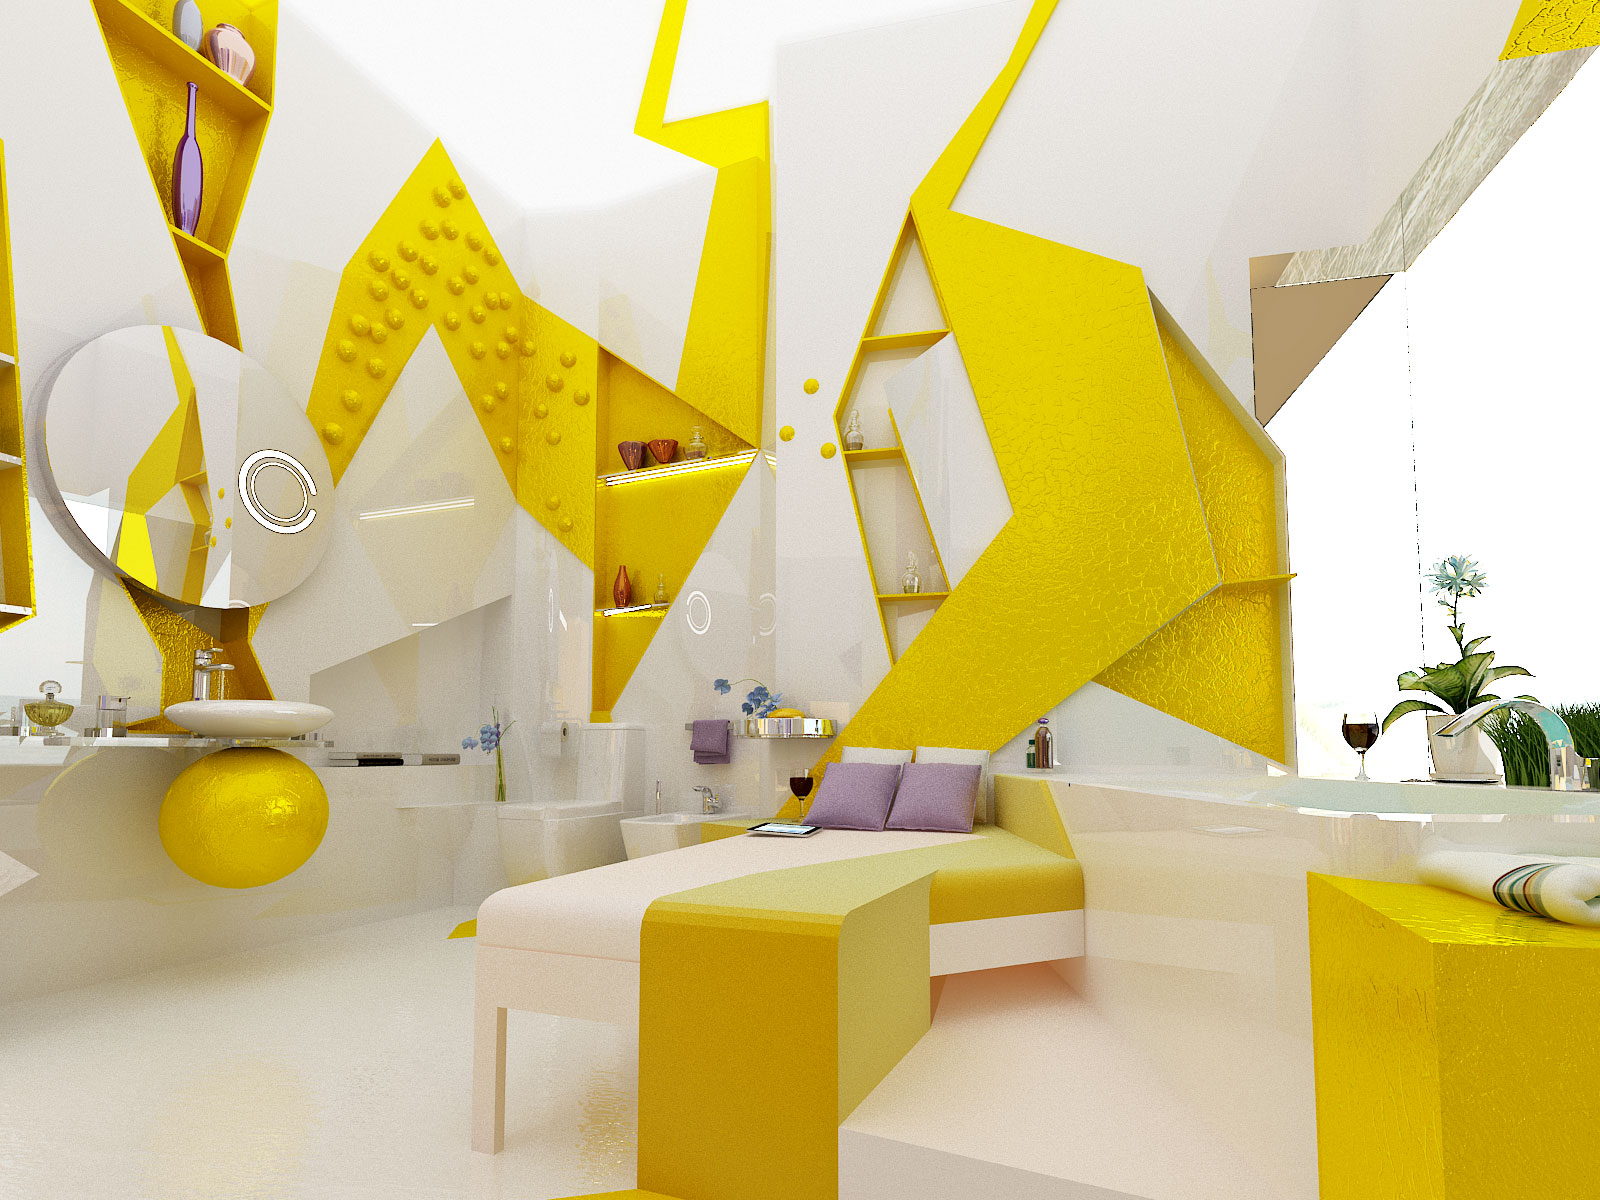 Stunning-Bathroom-Designs-by-Gemelli-Design-6